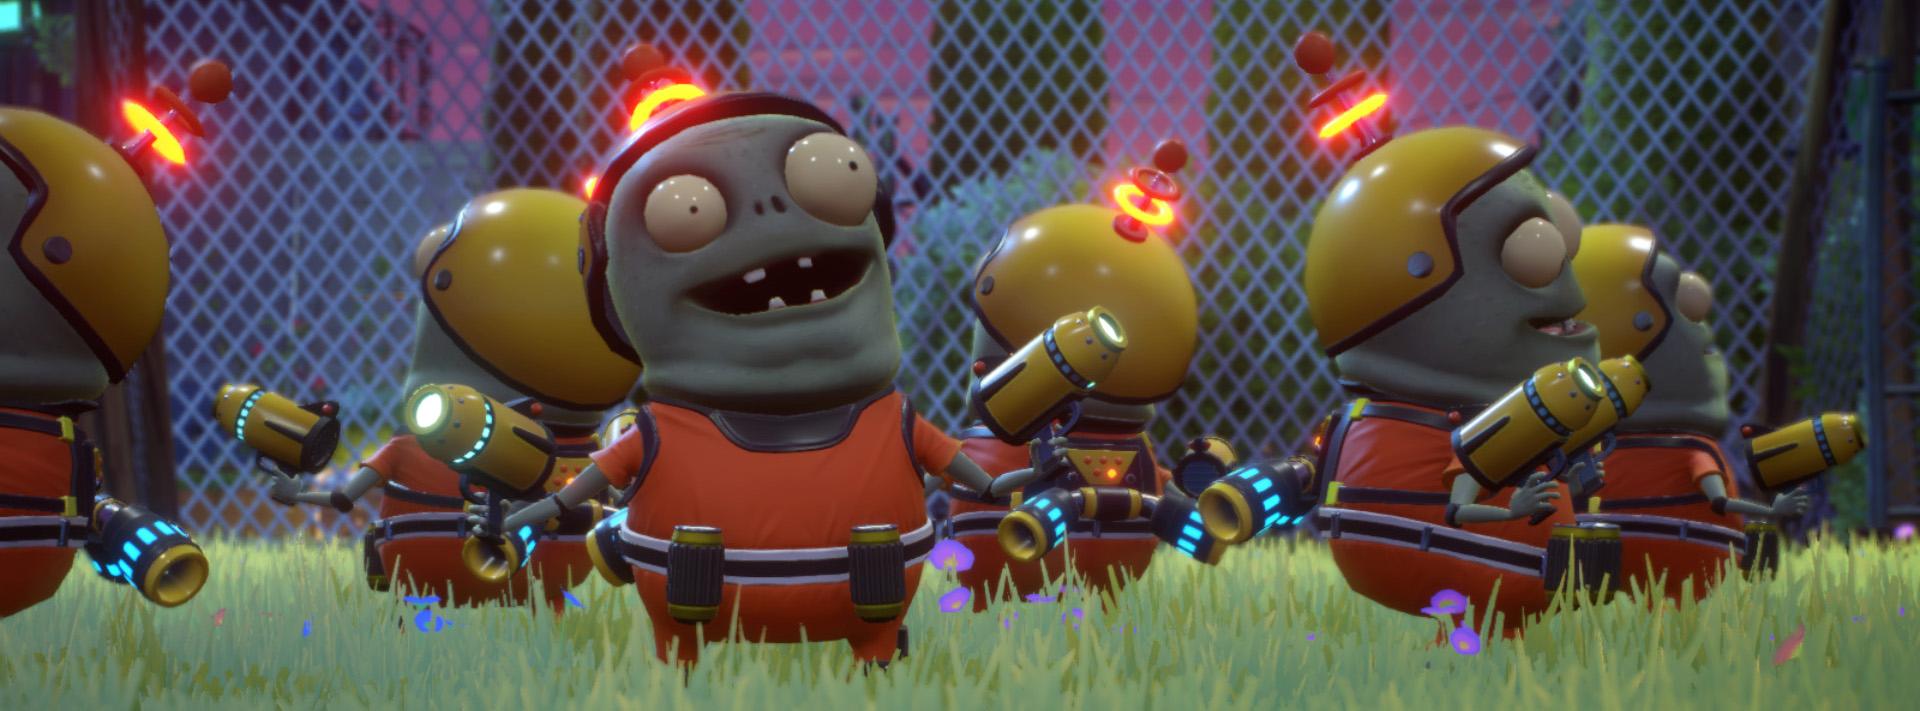 Plants vs Zombies Garden Warfare 2 - VGPRofessional (18)